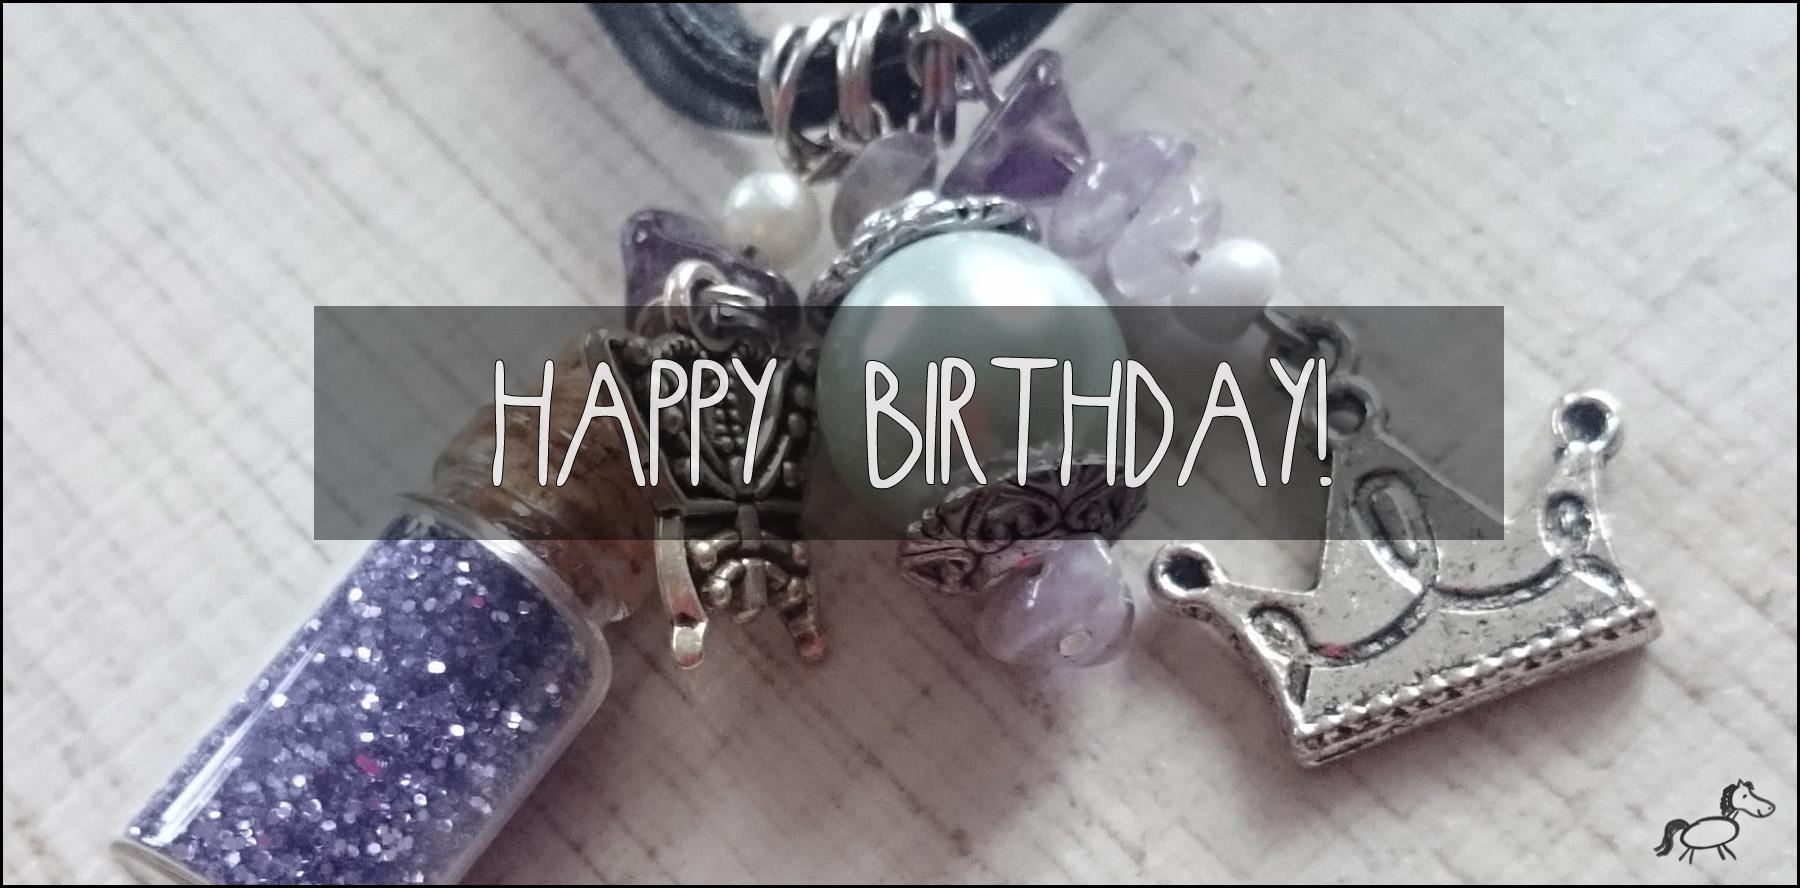 Chaospony-Kette zum Blog-Geburtstag